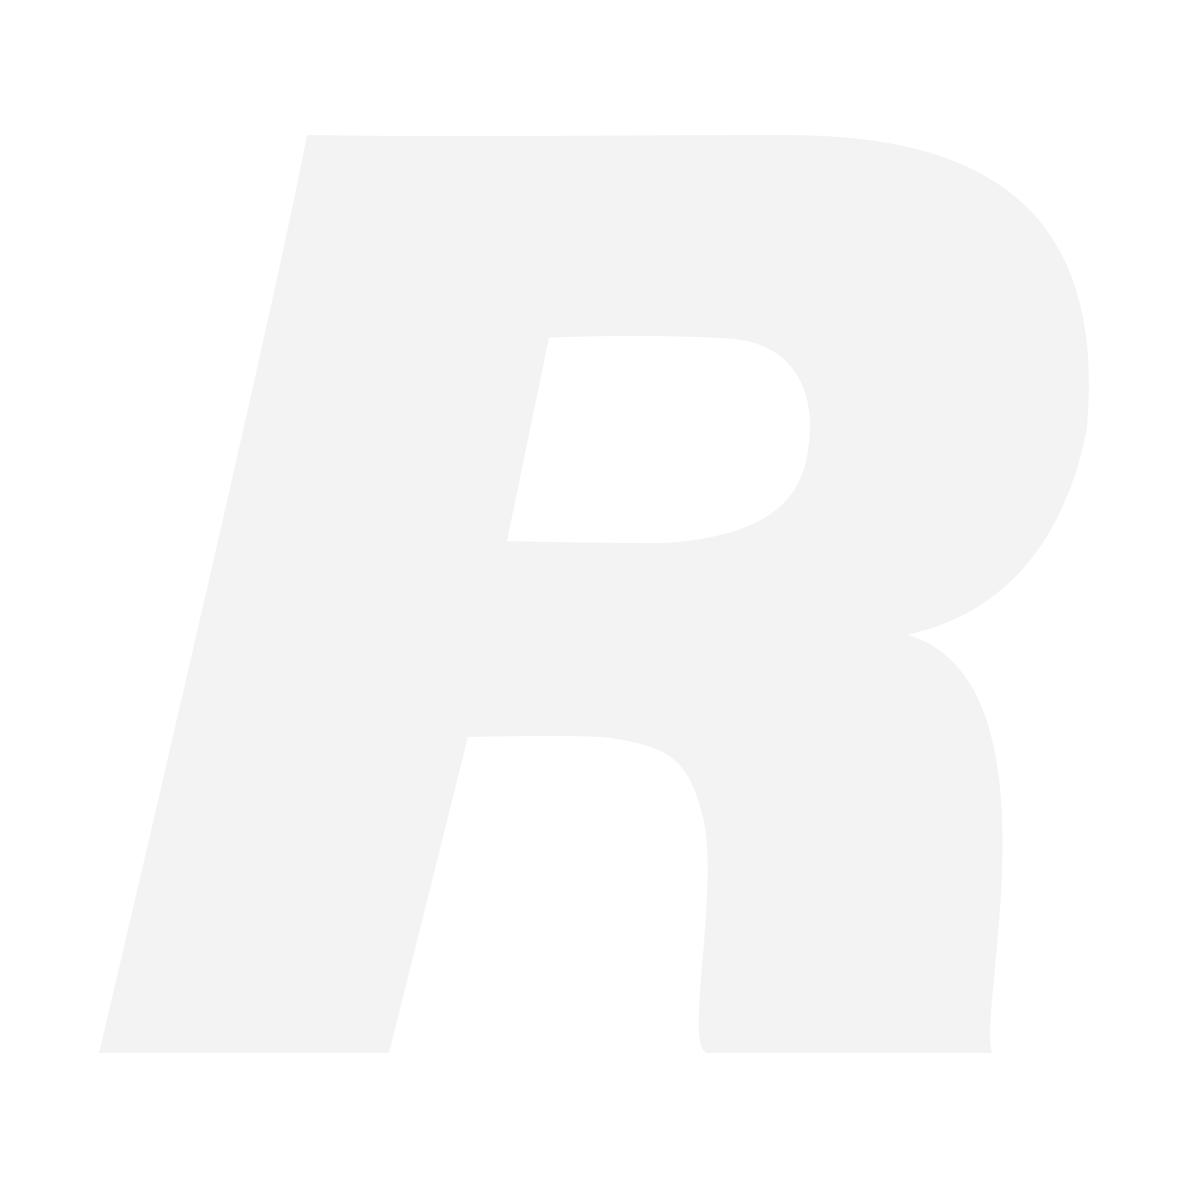 LASTOLITE L5921 Black/White Reversible 180cm x 215cm